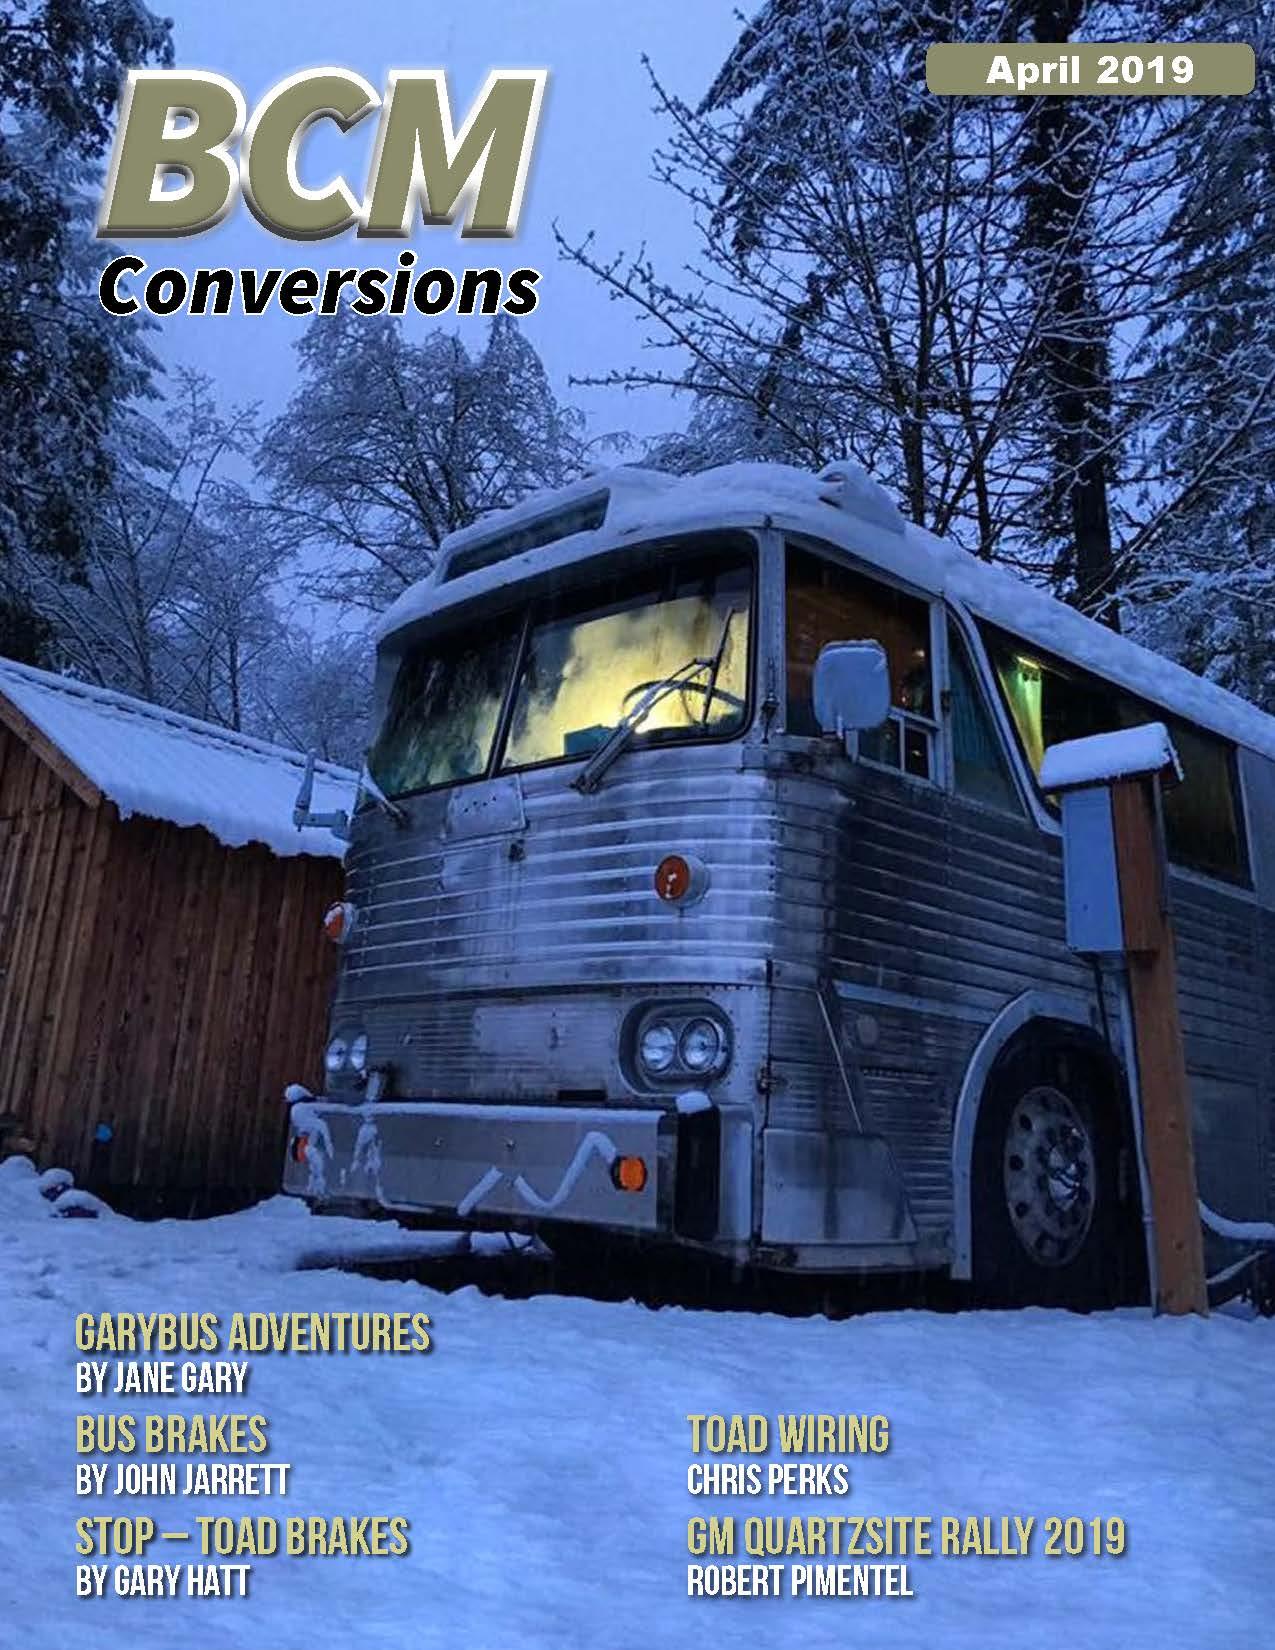 "<a href=""""><img class=""spu-open-10240"" src=""https://www.busconversionmagazine.com/wp-content/uploads/2019/04/April-Issue-2019-Teaser.jpg""></a>"